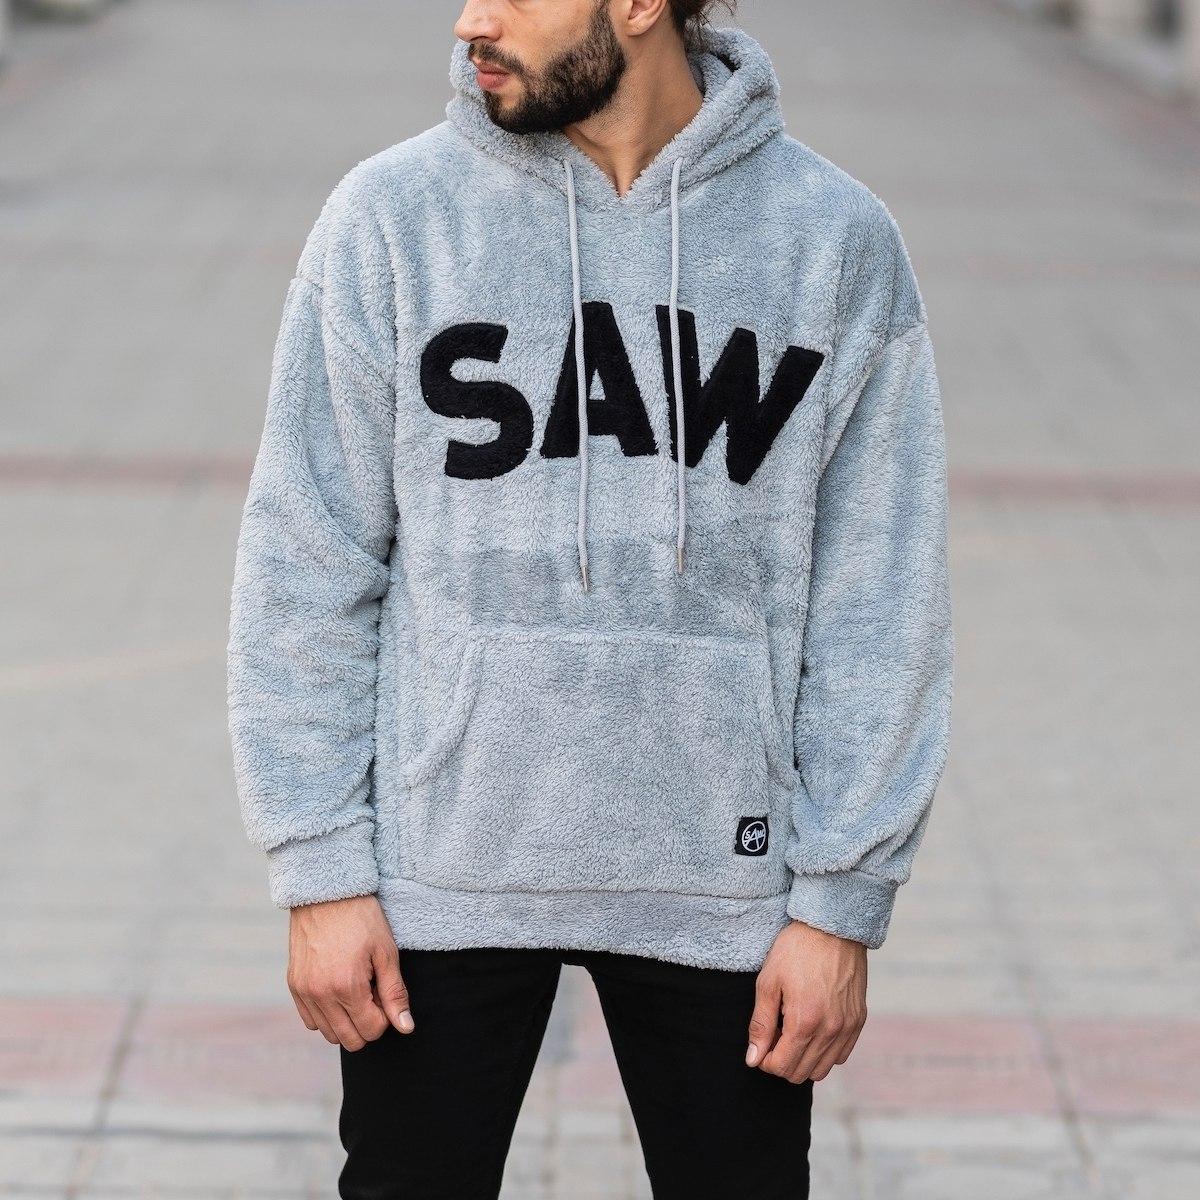 Men's Saw Hooded Sweatshirt With Pockets Gray Mv Premium Brand - 2